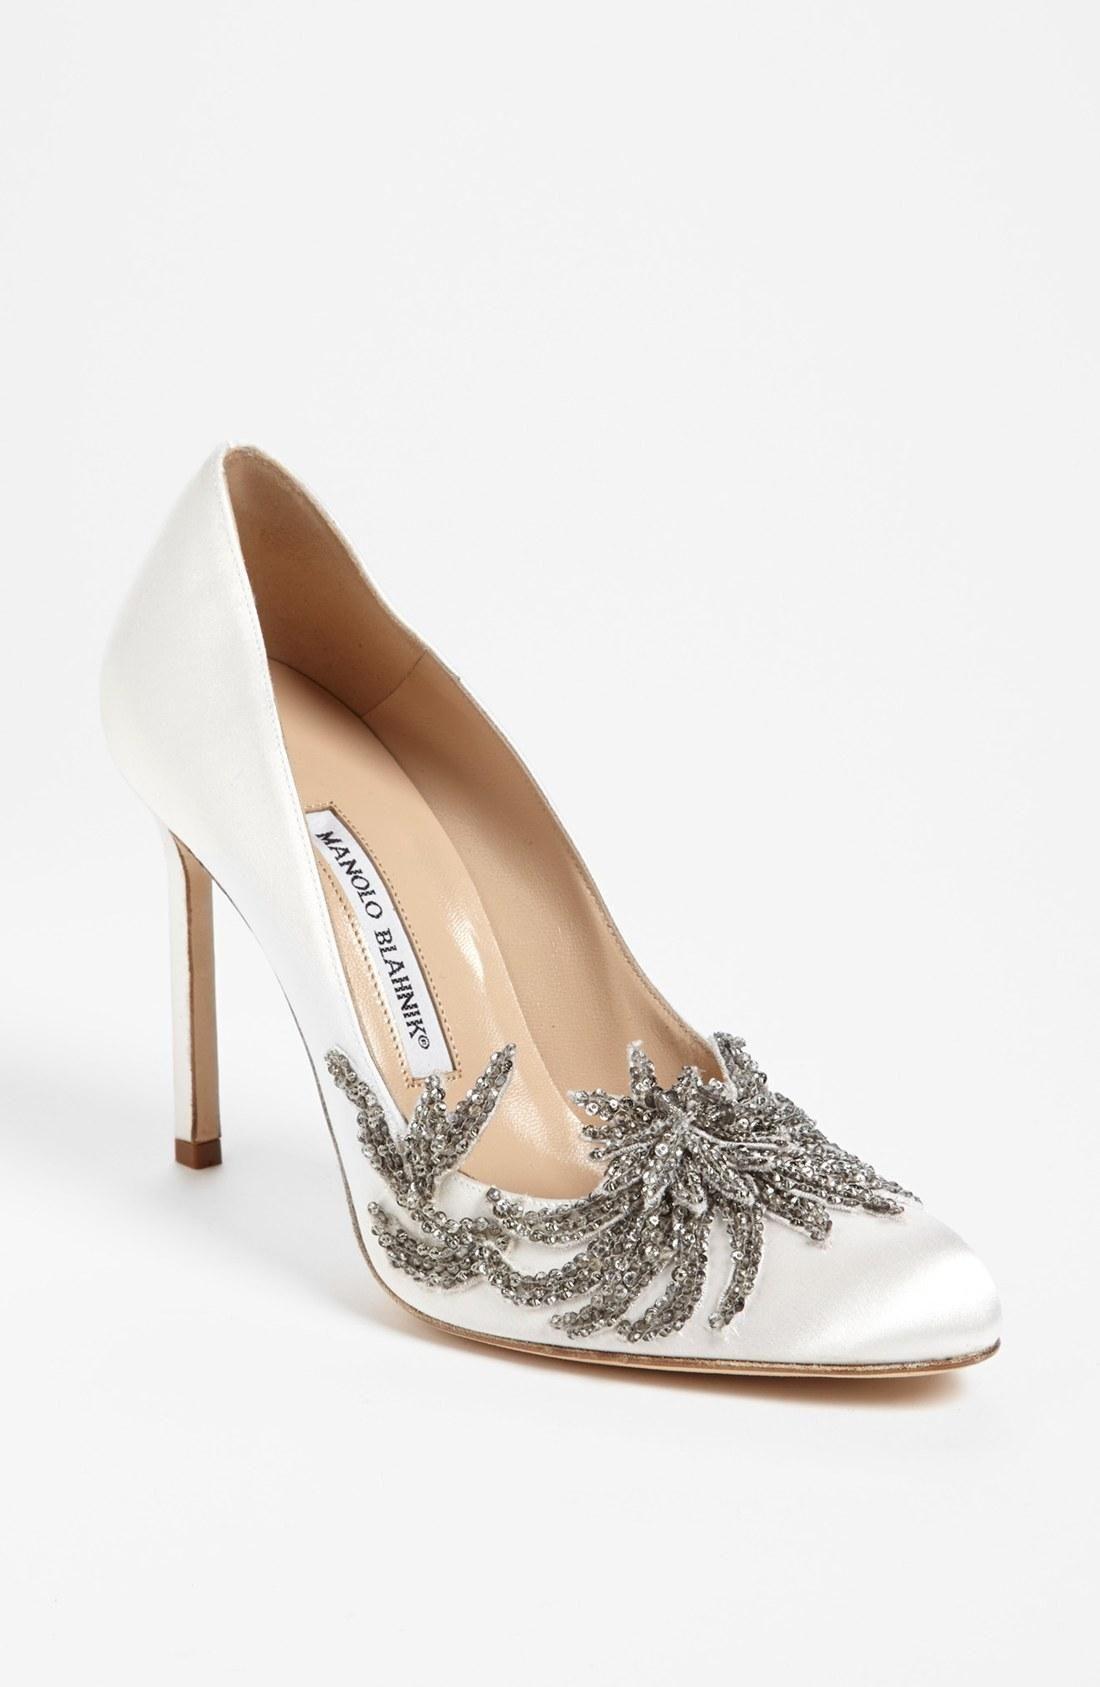 Manolo Blahnik Swan Pump Women Nordstrom Dream Wedding Shoes Manolo Blahnik Manolo Blahnik Heels